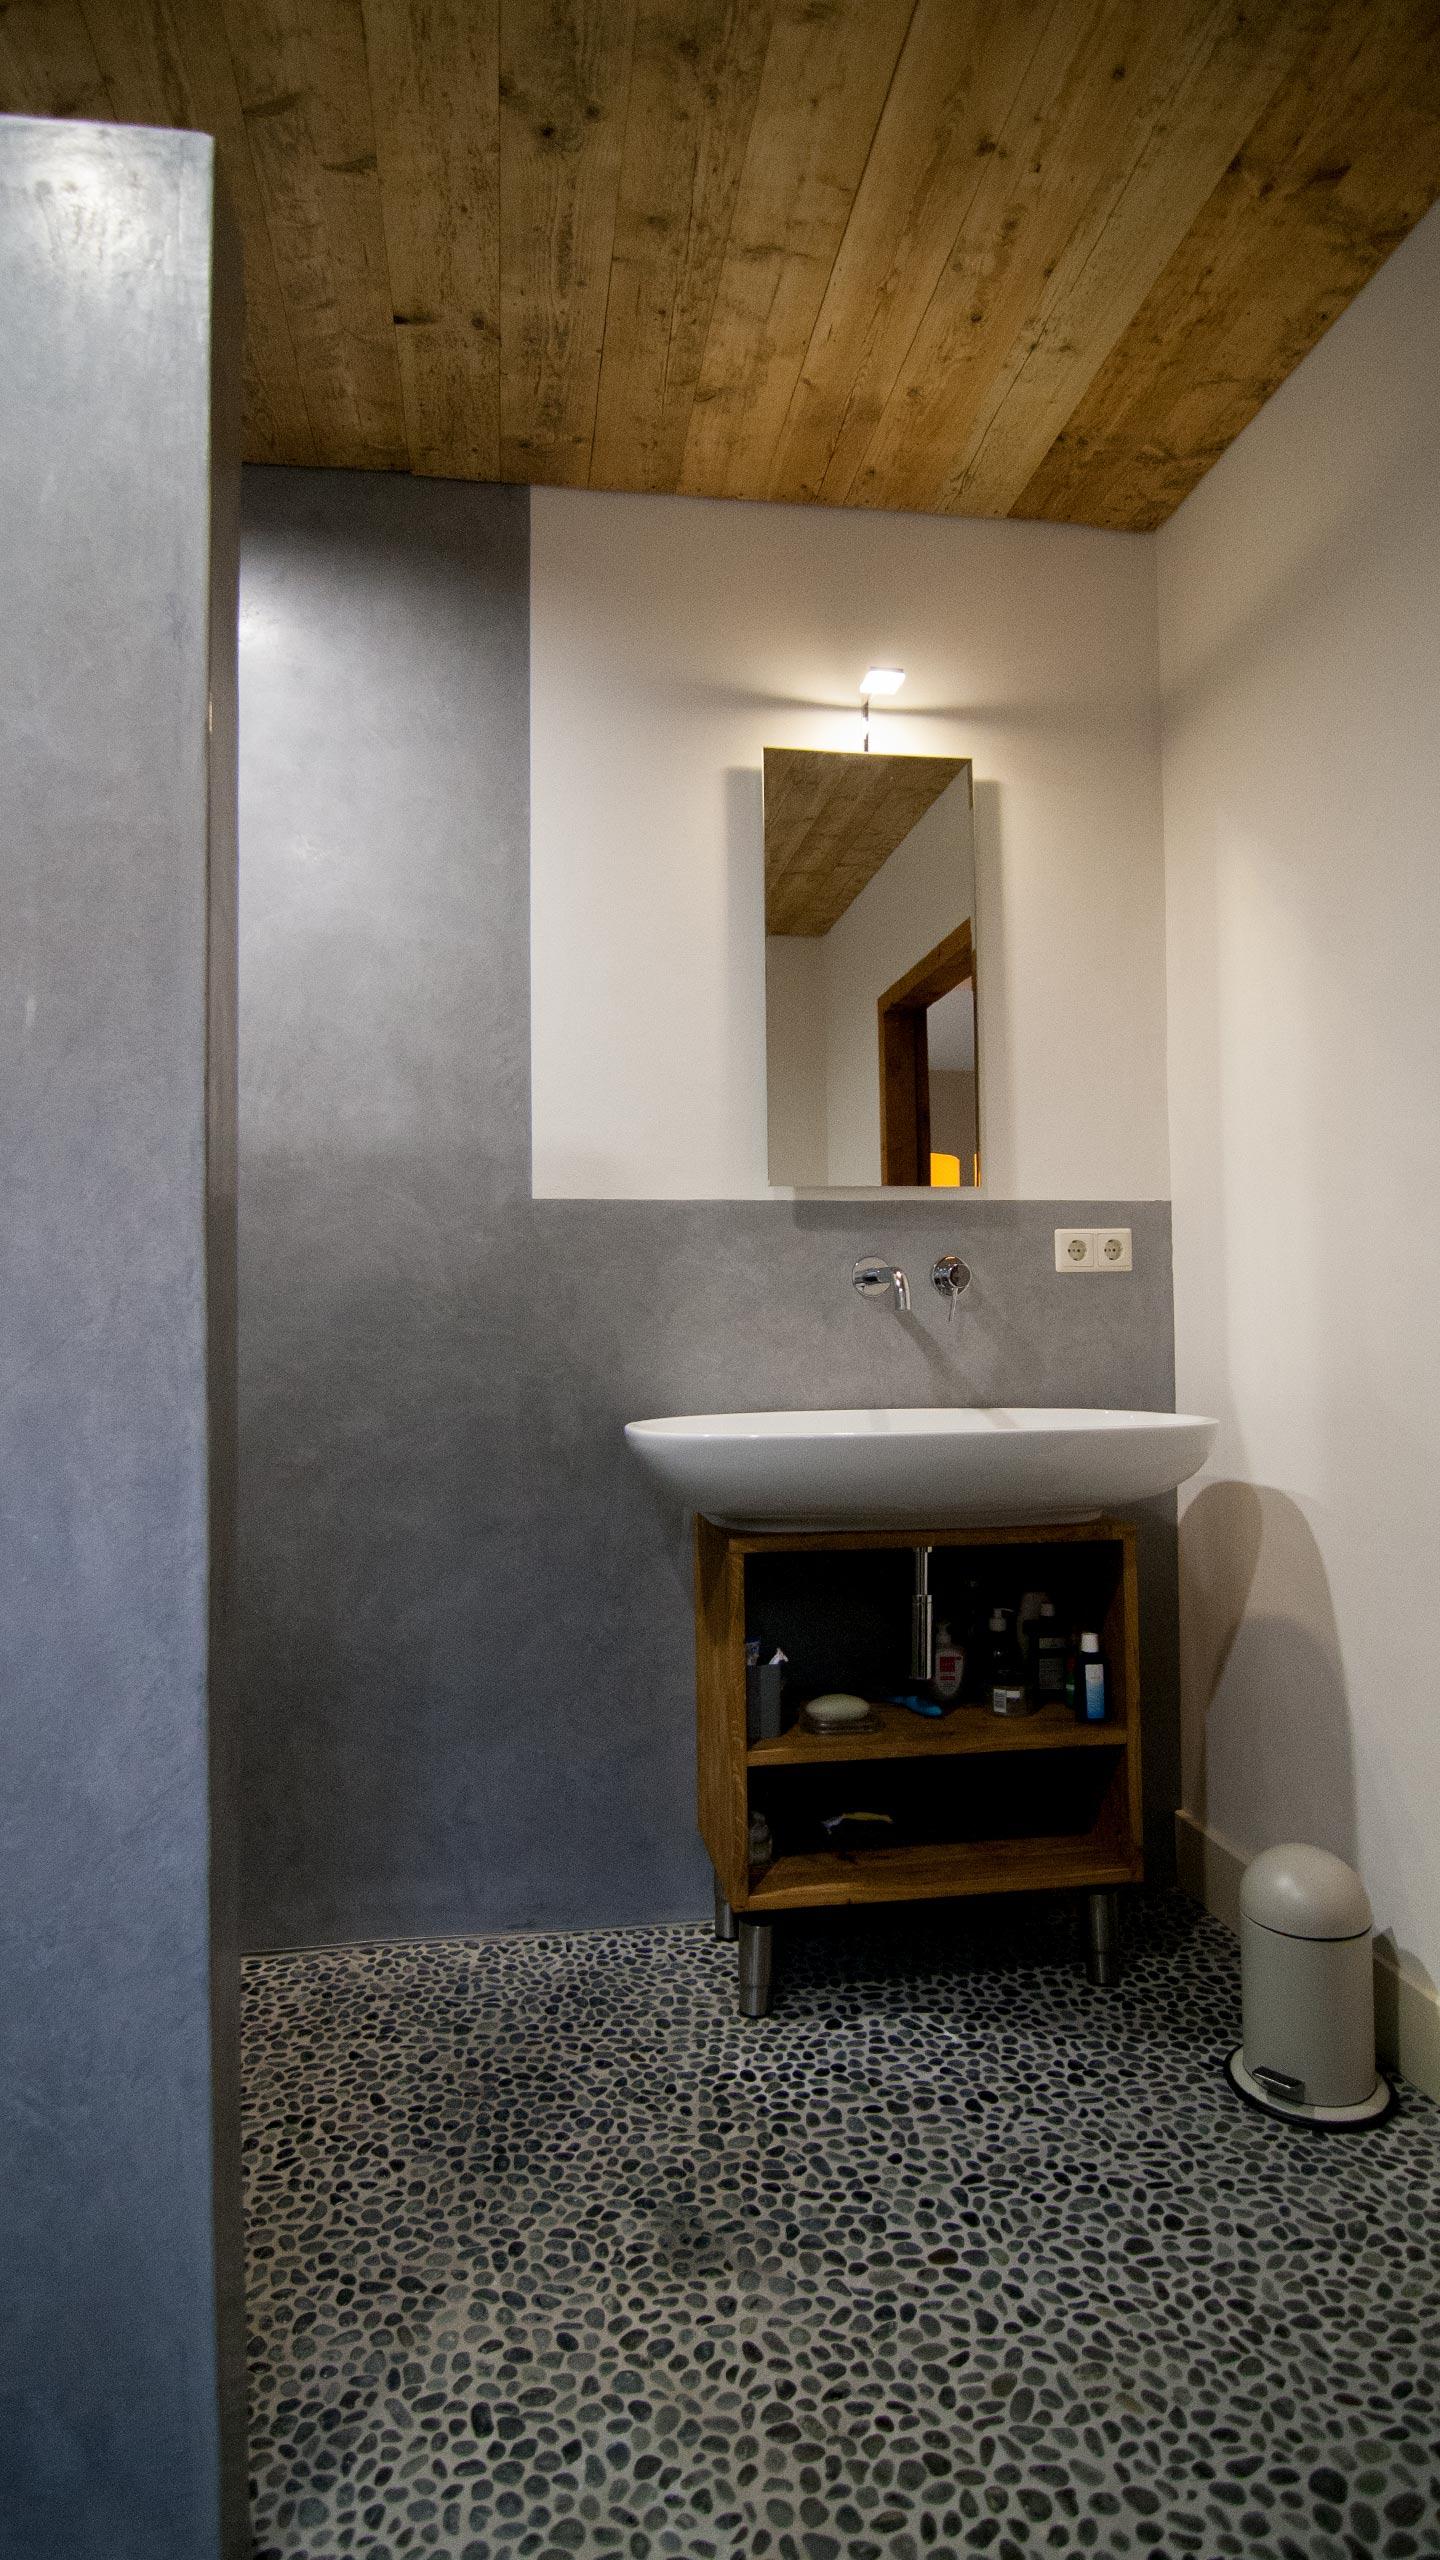 WaterproofStucco - Pearl Grey Bathroom, Combinations